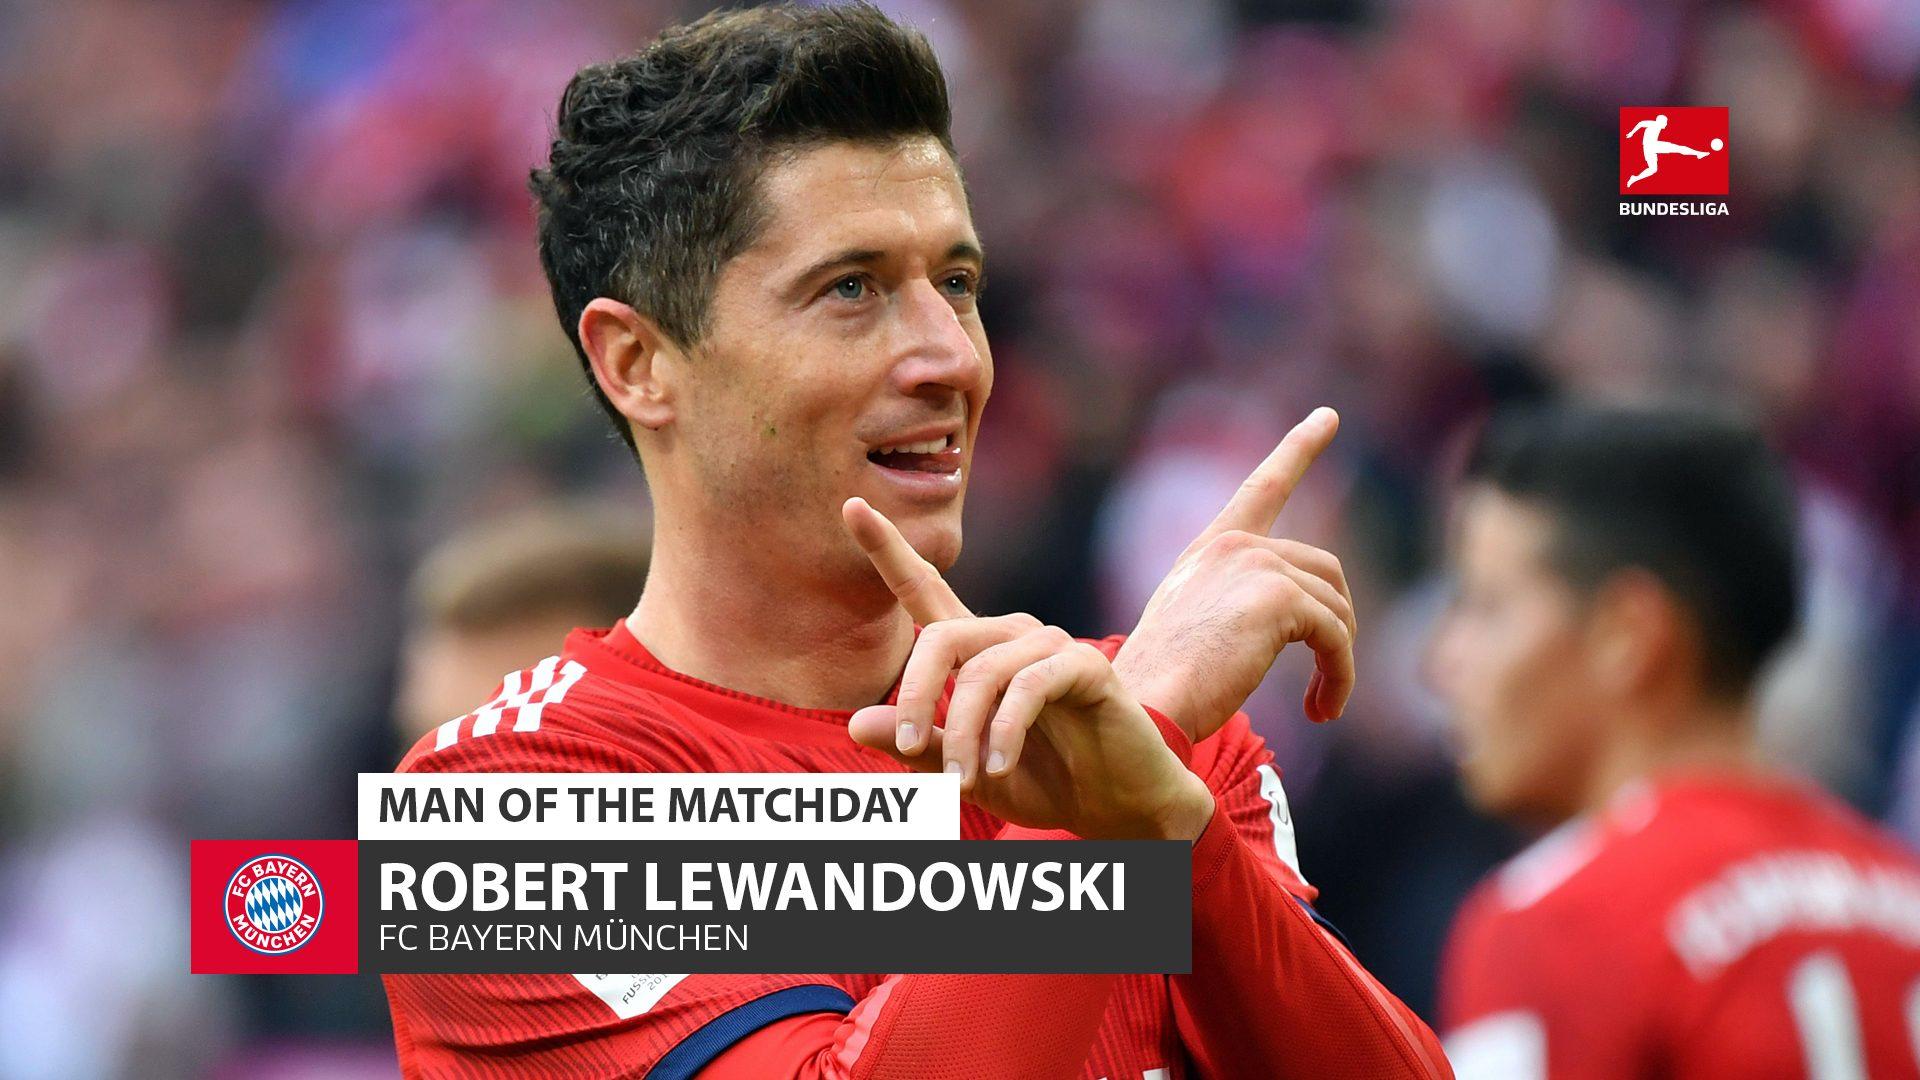 bundesliga robert lewandowski the record foreign scorer and matchday 25 s man of the matchday bundesliga robert lewandowski the